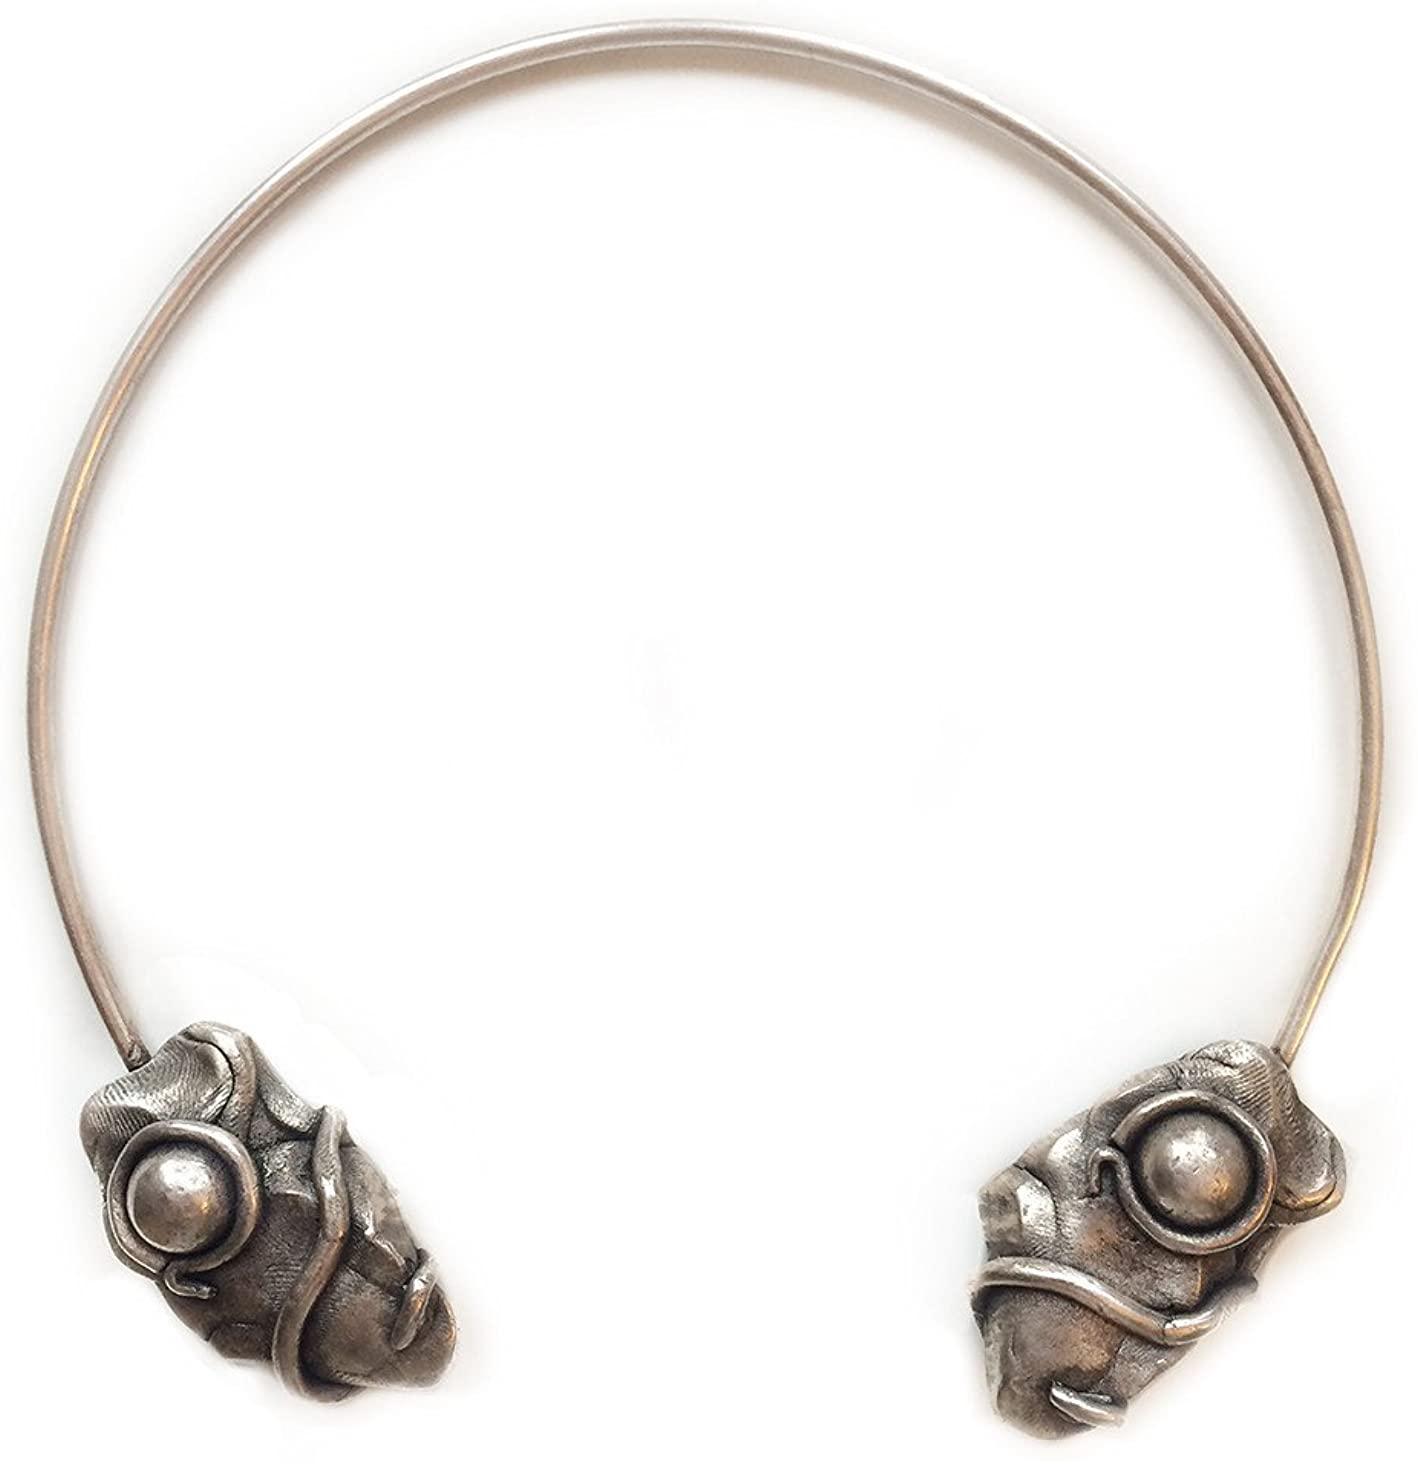 Second Daughter Orbit Collar with Stones